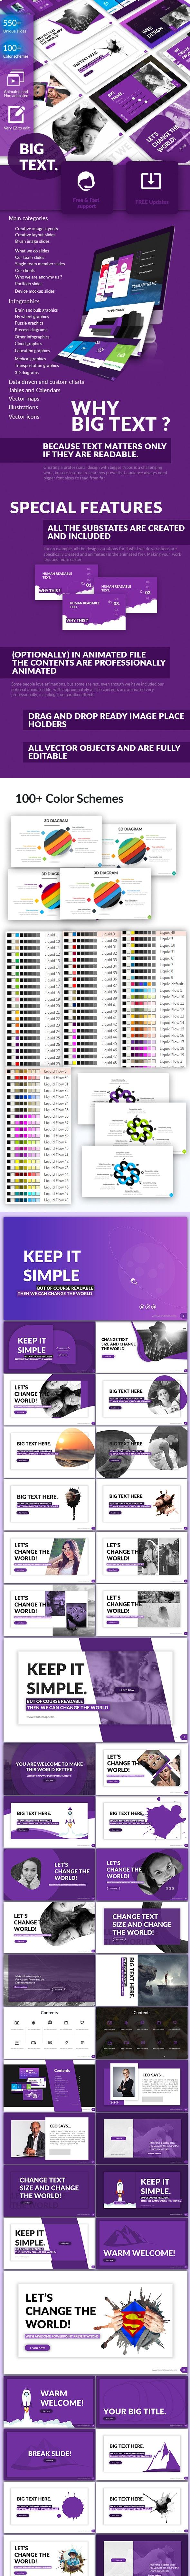 Big Text - Google Slides Presentation Template - Google Slides Presentation Templates